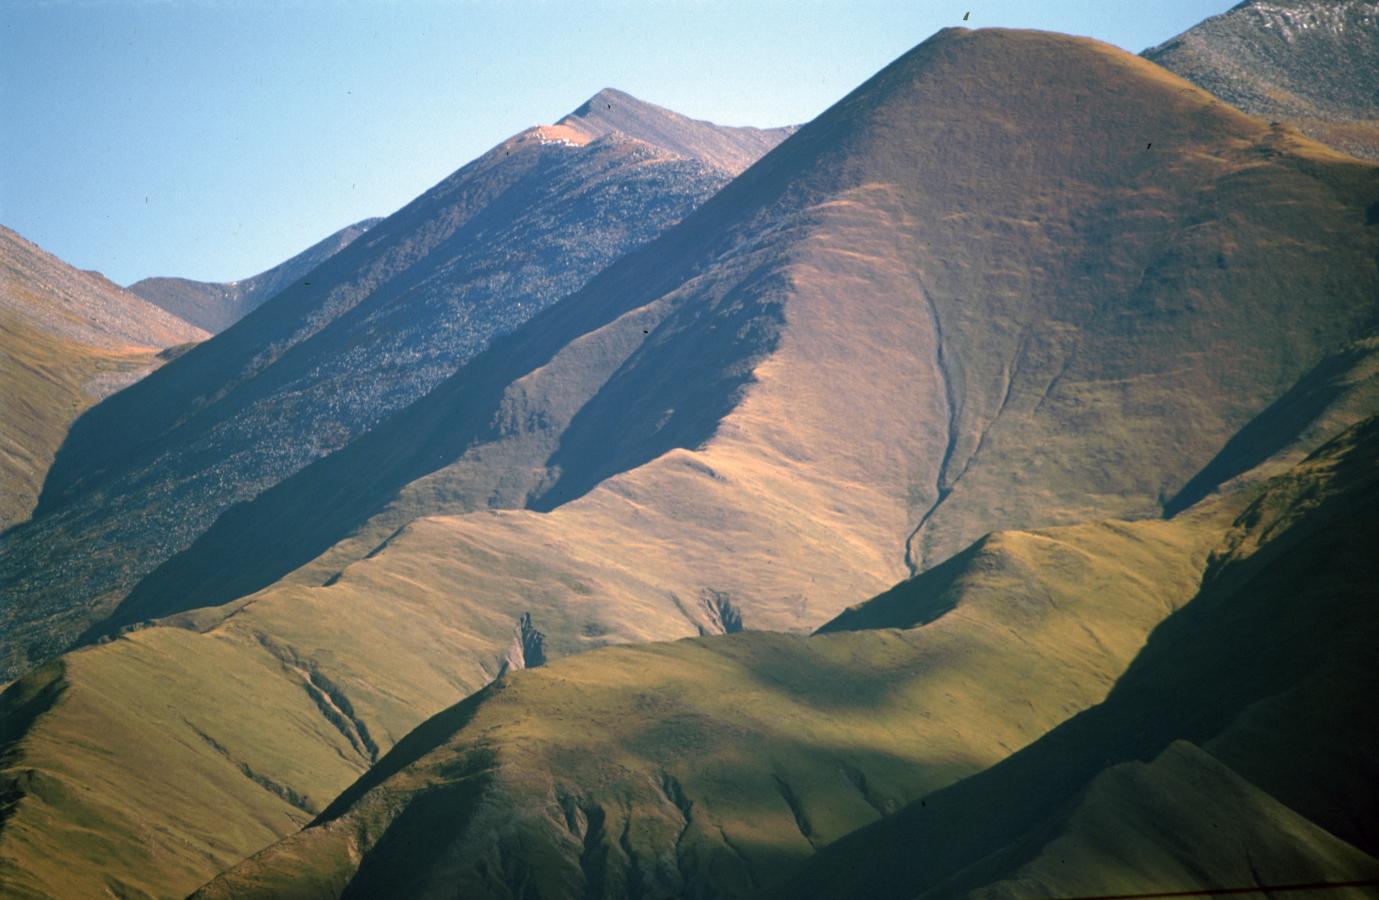 mountains-around-lhasa-tibet-2000